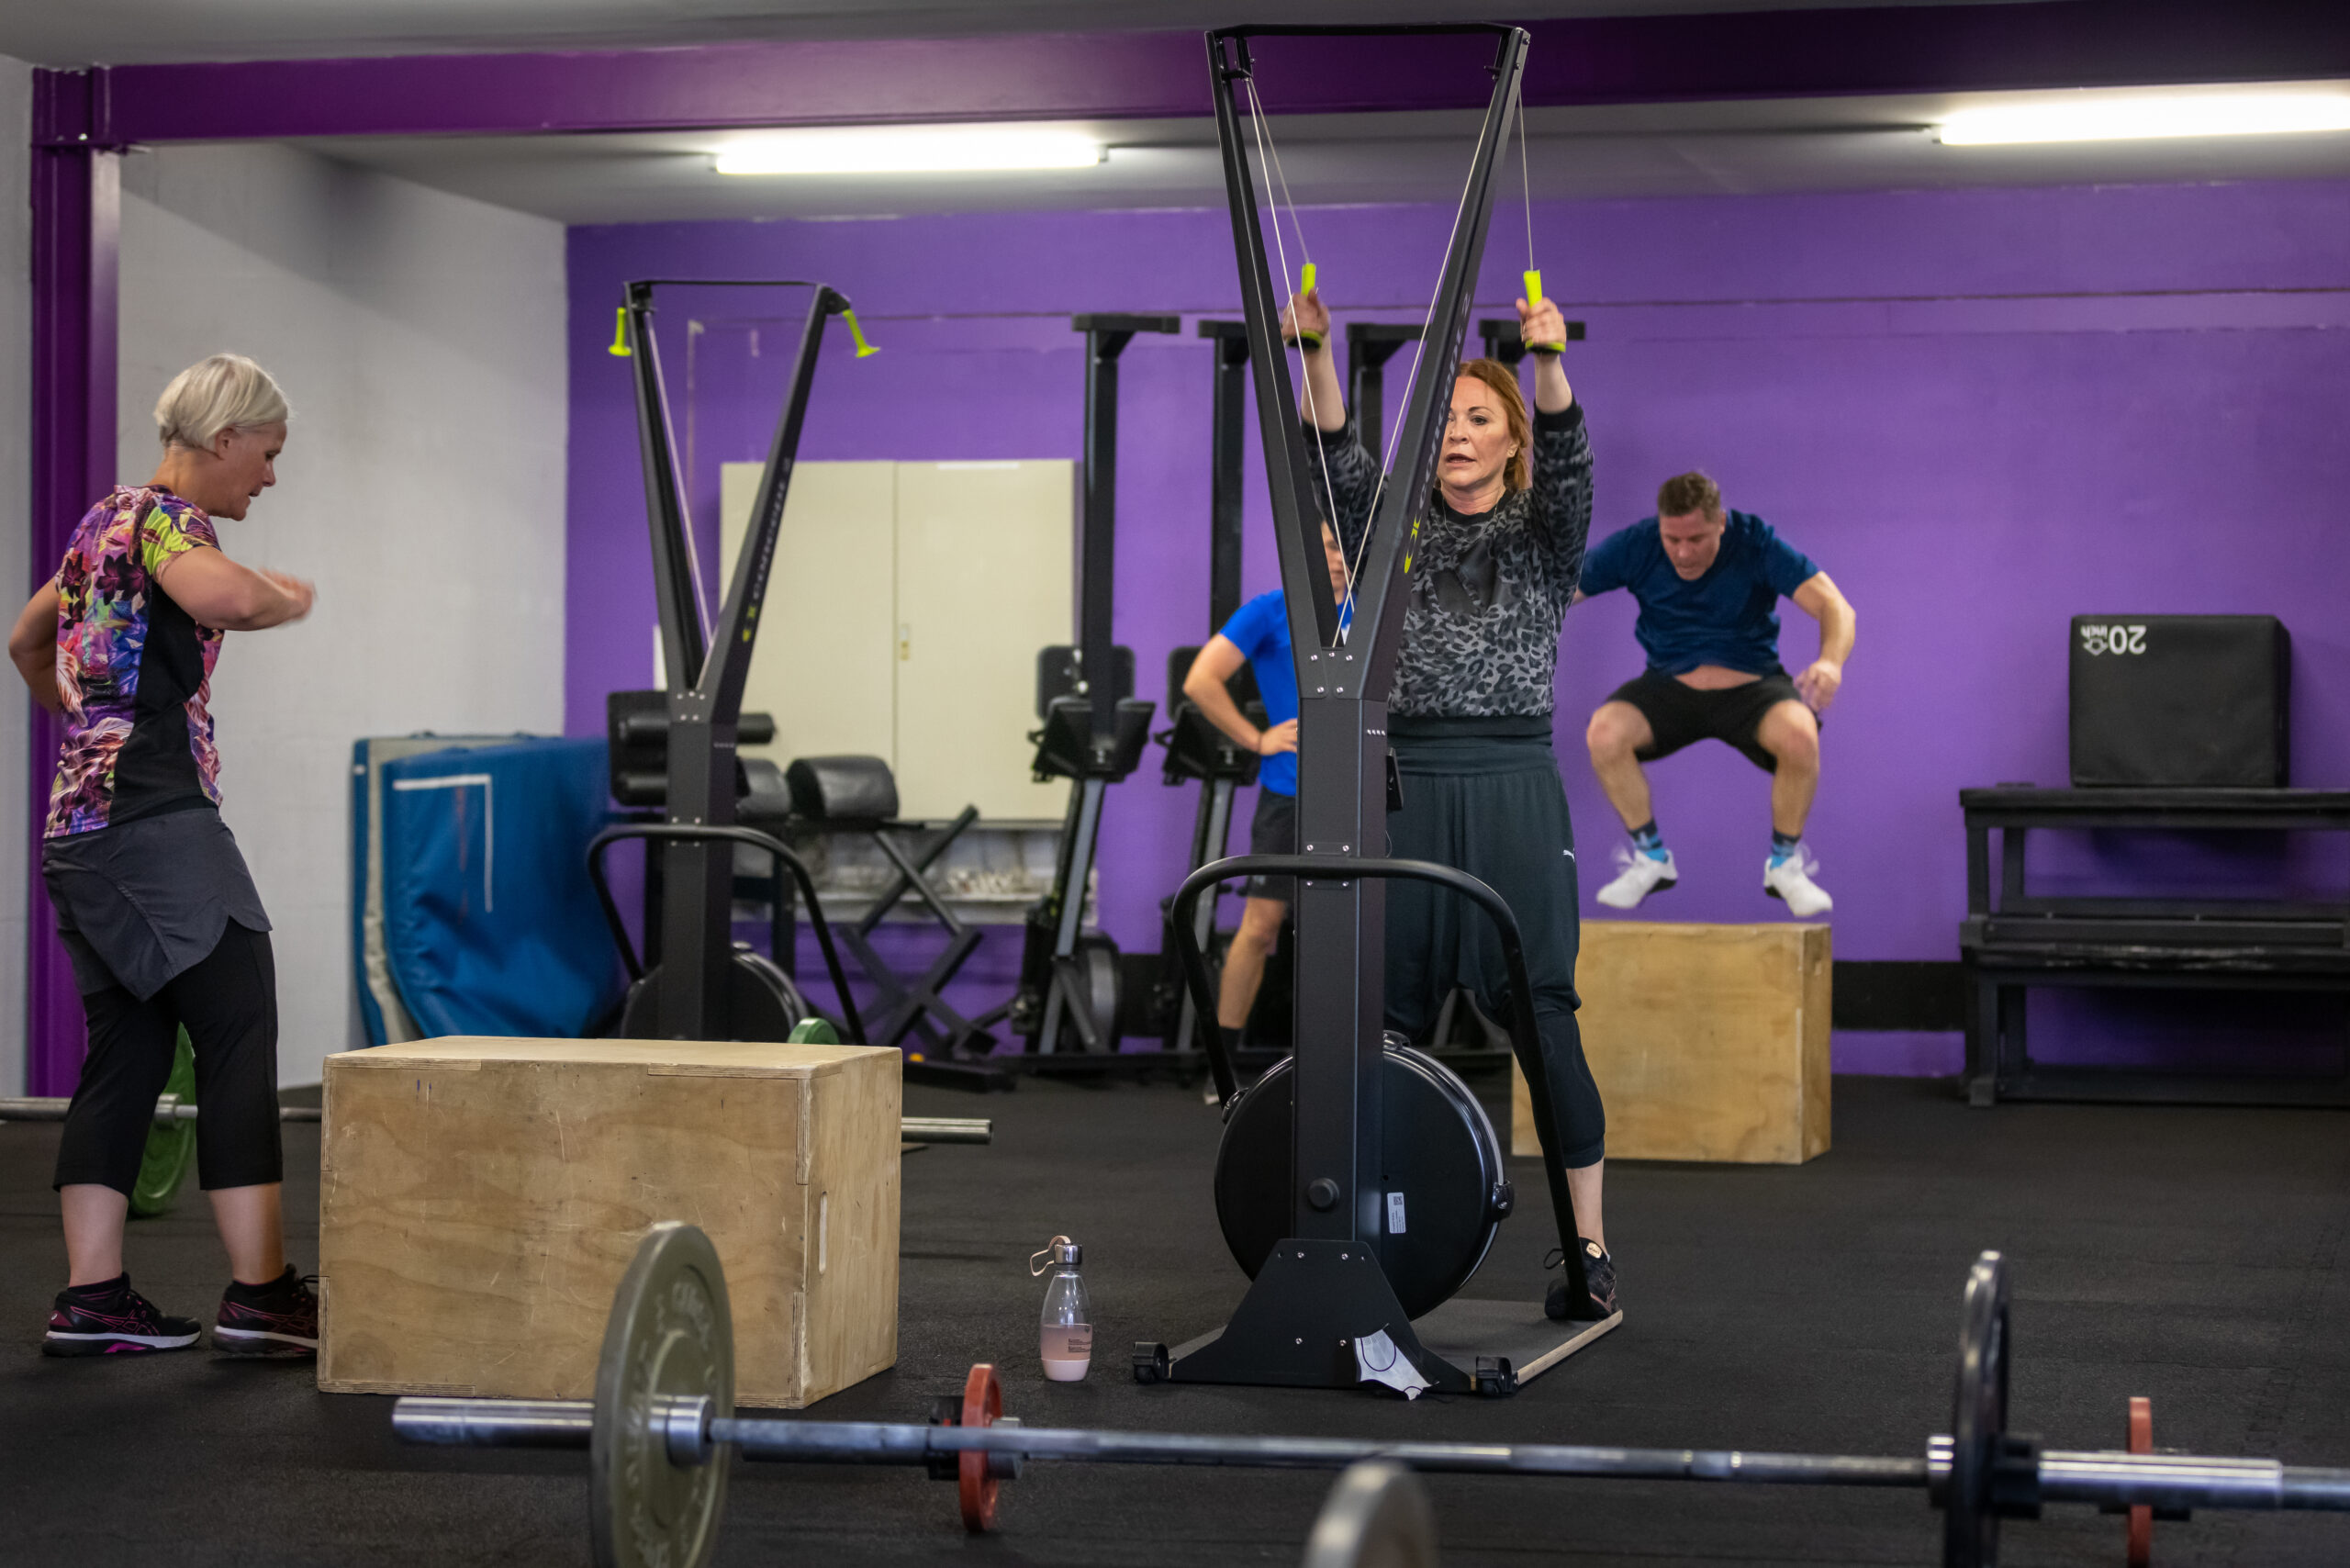 Gold Coast Fitness - Funktionelles Fitnesstraining Gym Uetikon am See